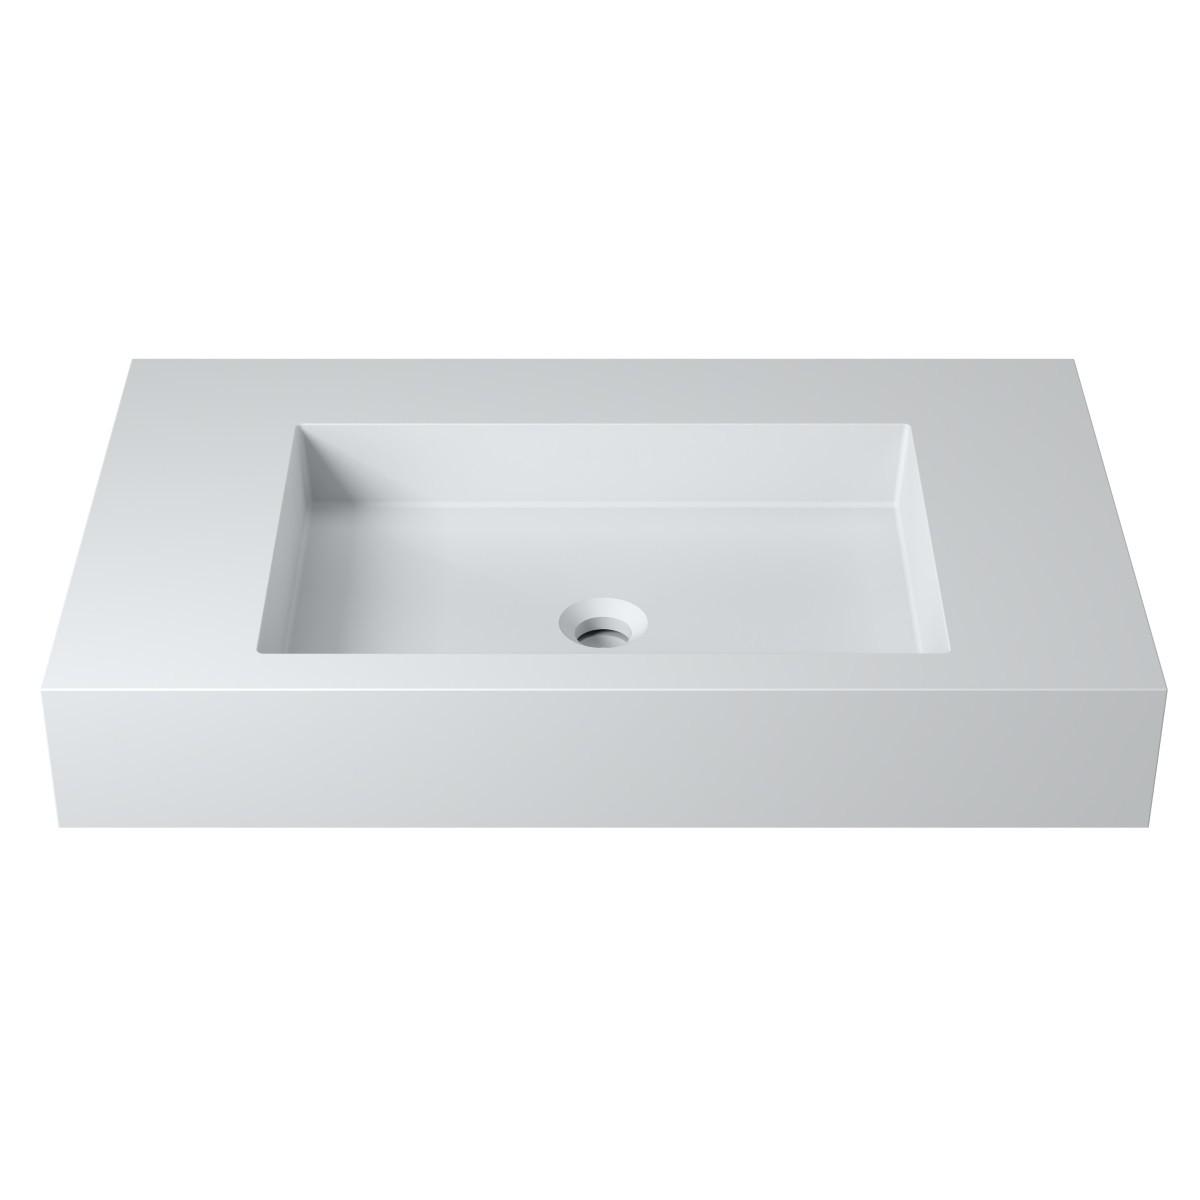 waschtisch k75 waschtische mineralguss. Black Bedroom Furniture Sets. Home Design Ideas